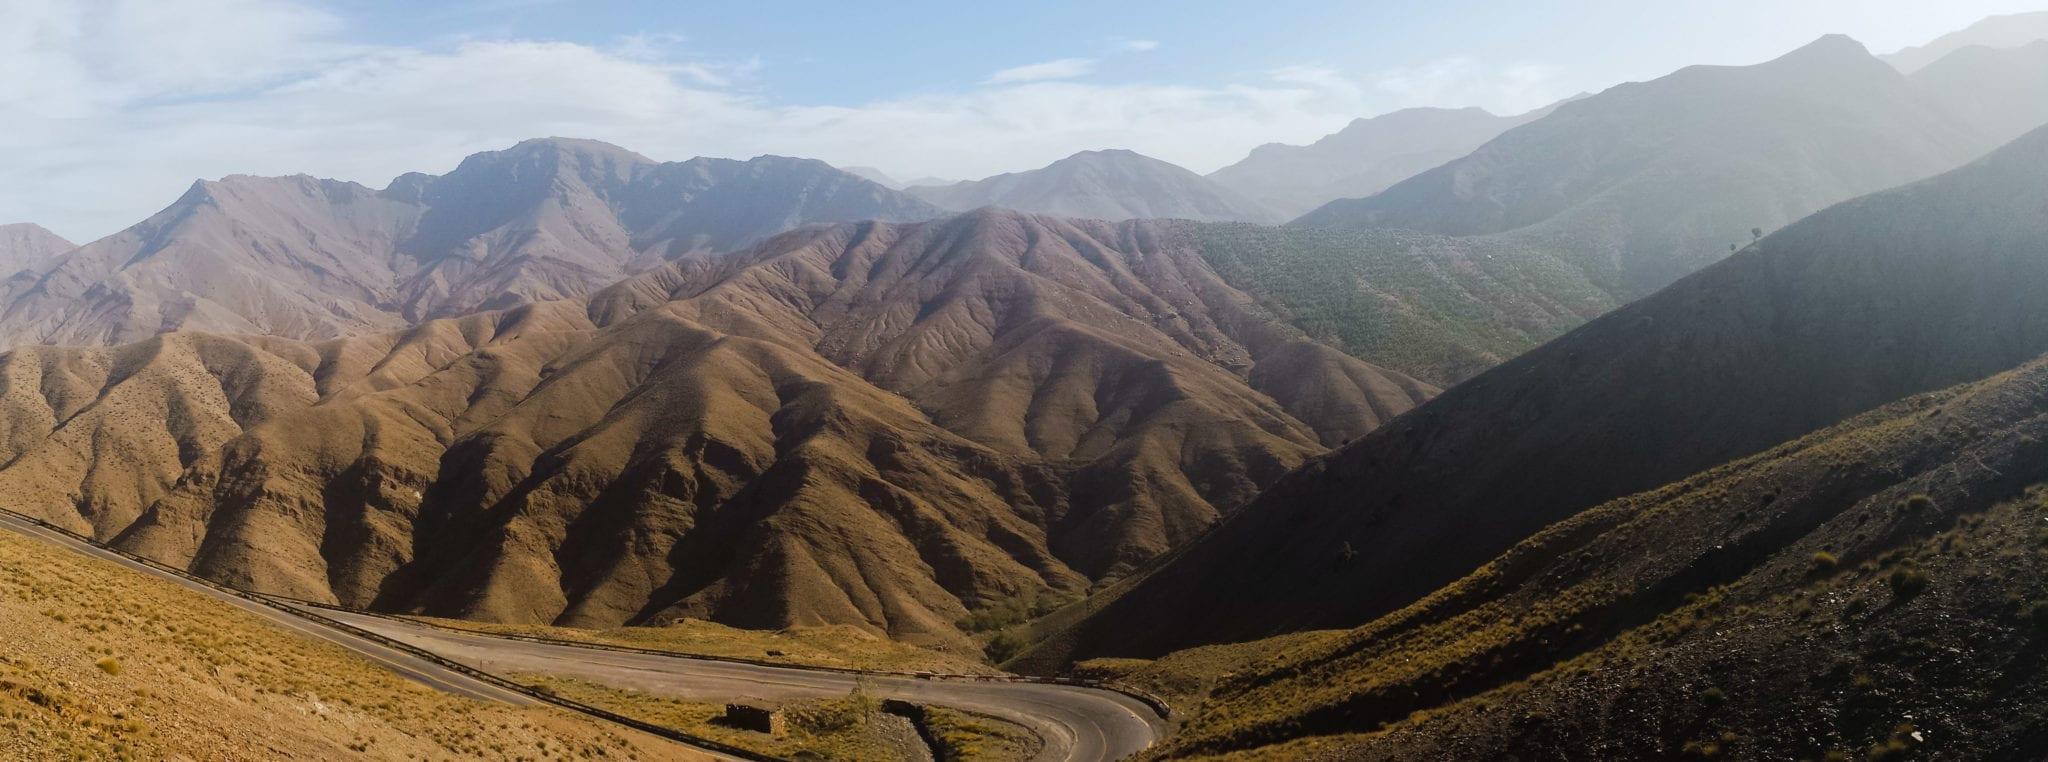 Hike the Atlas Mountains